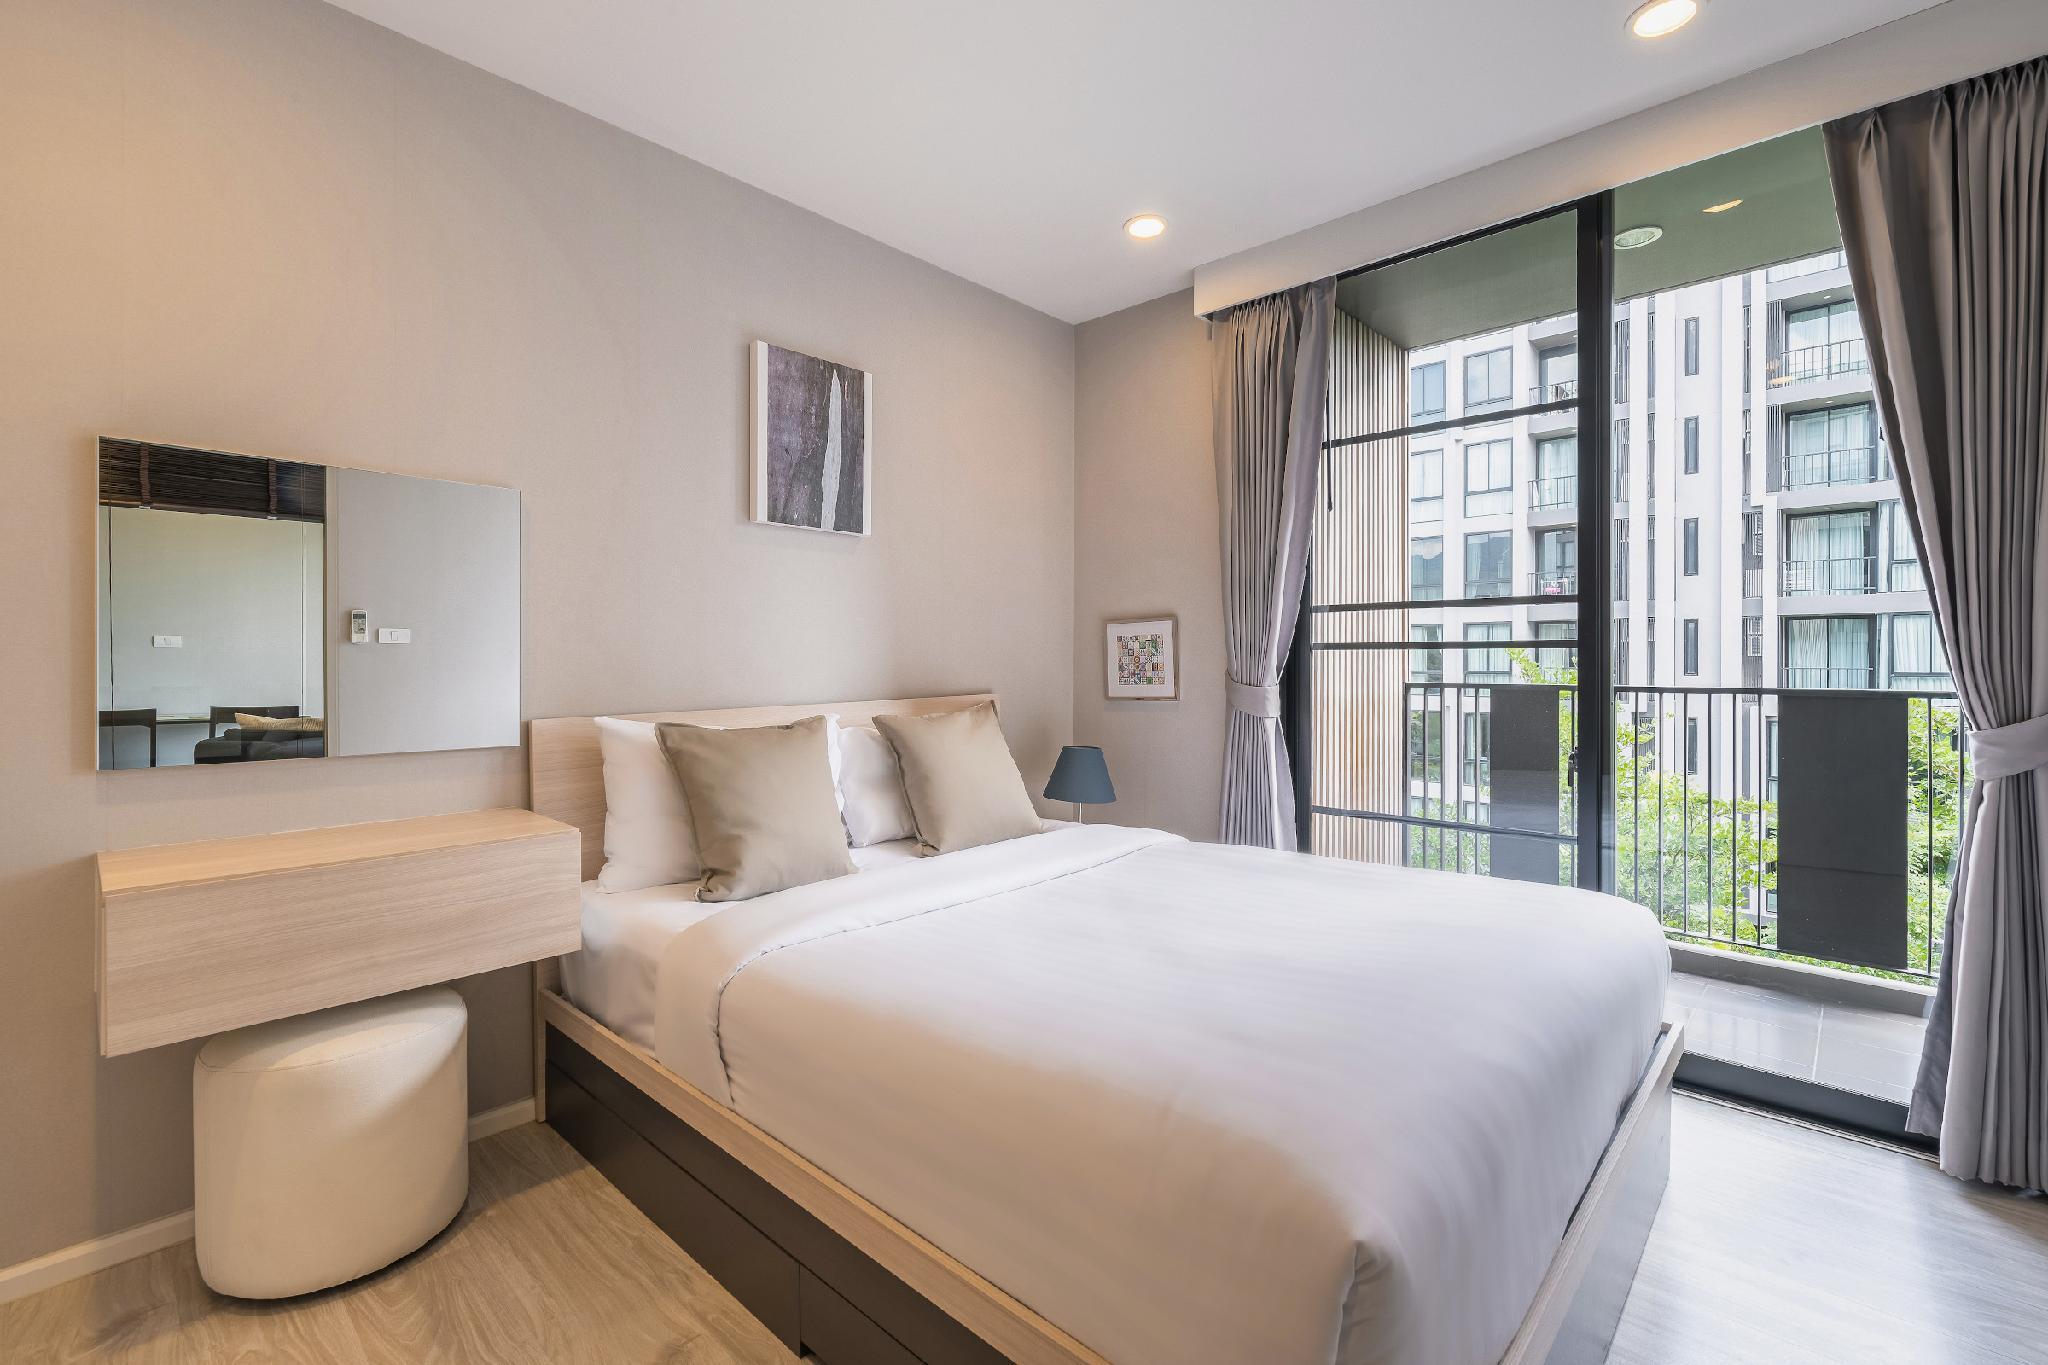 One Bedroom Suite In Nimman By Belcarra Spaces F47